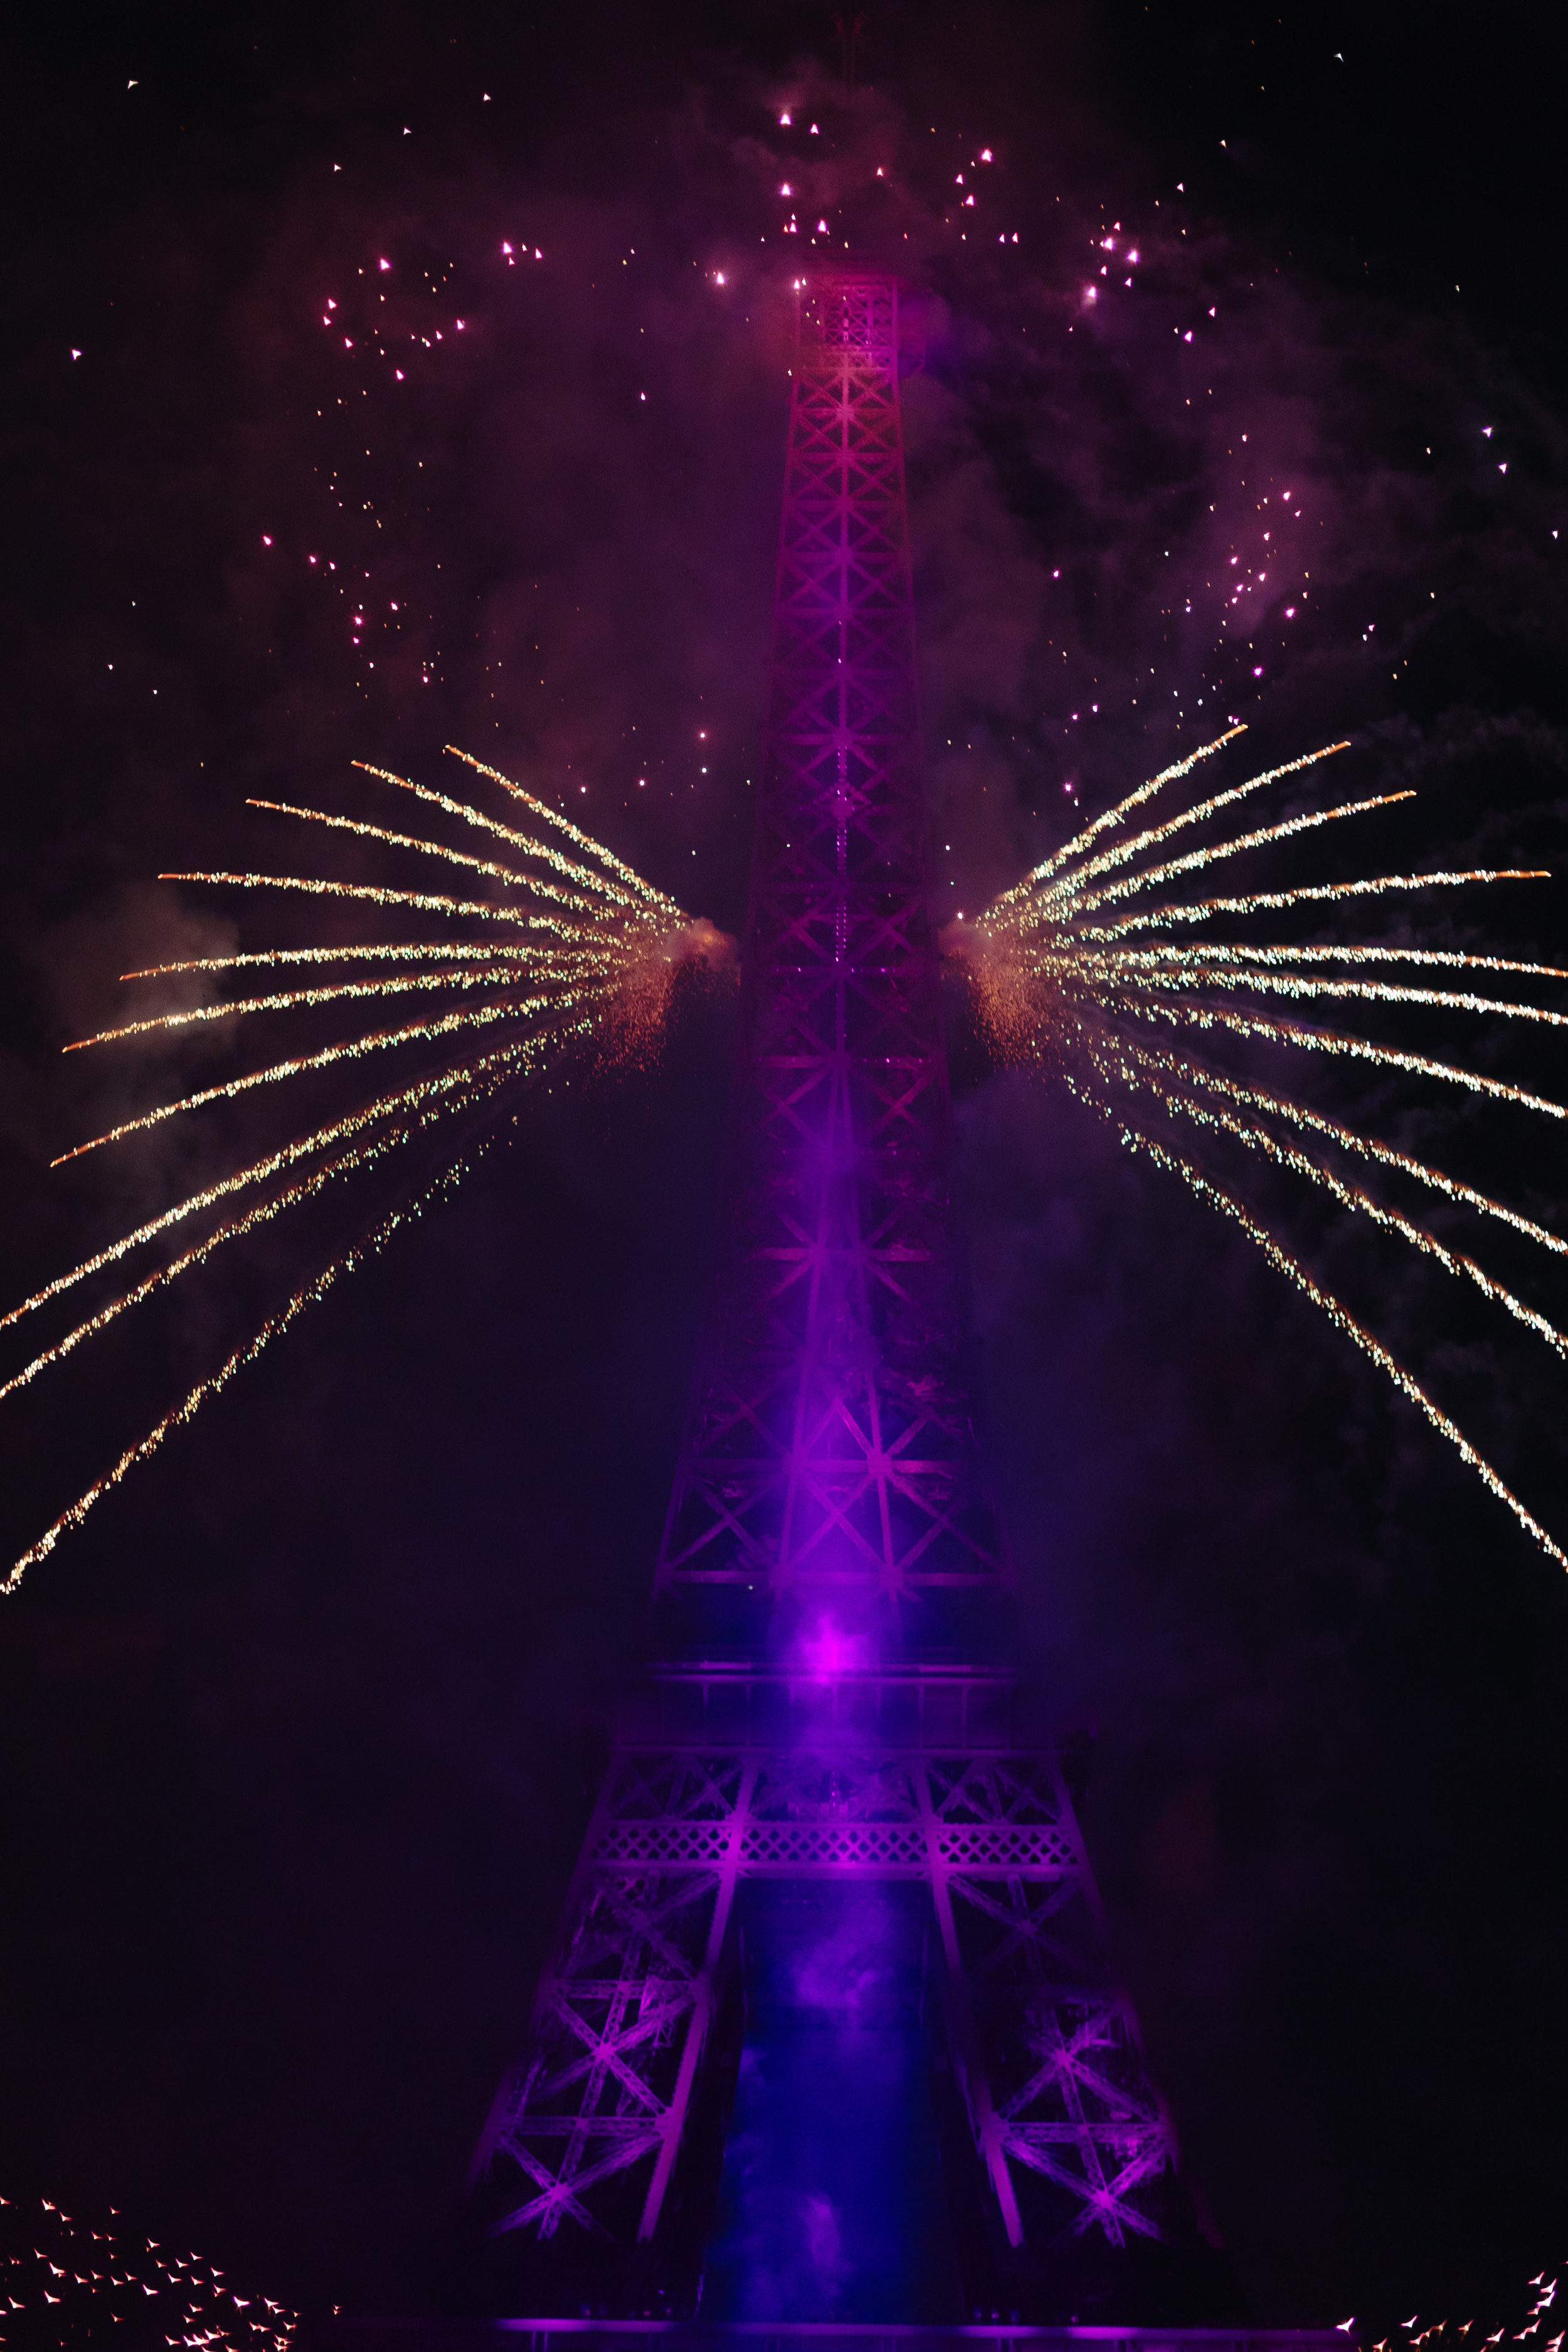 Copy of Paris Photographer 14 July Bastille day Eiffel Tower Iheartparisfr